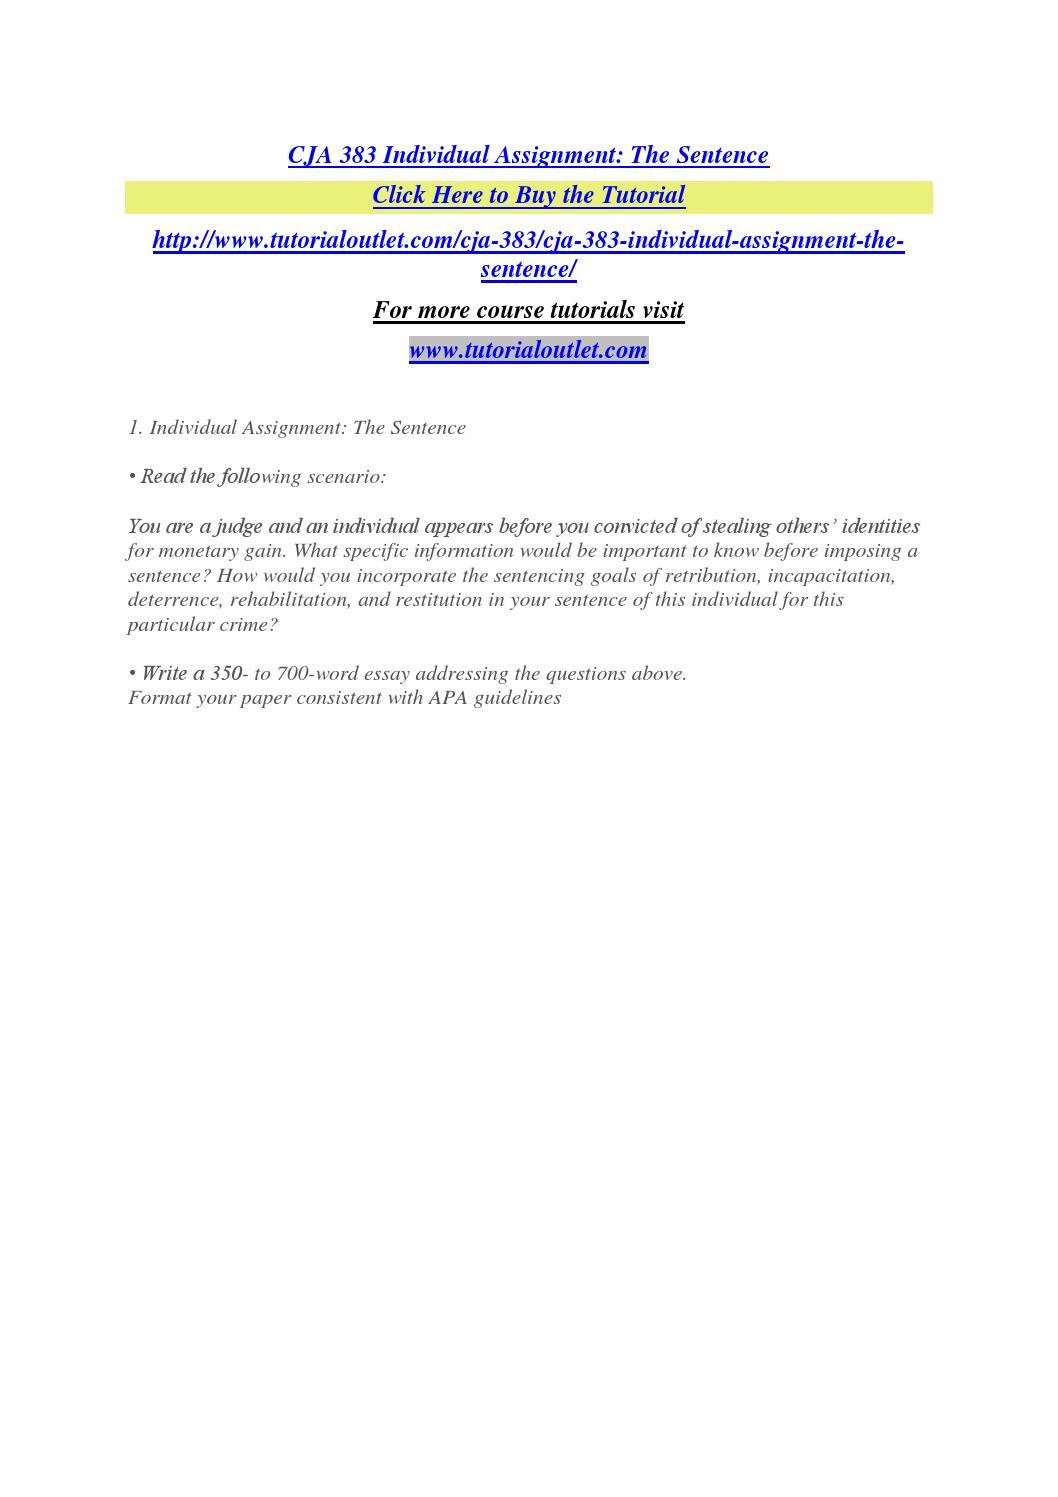 Essay on incapacitation